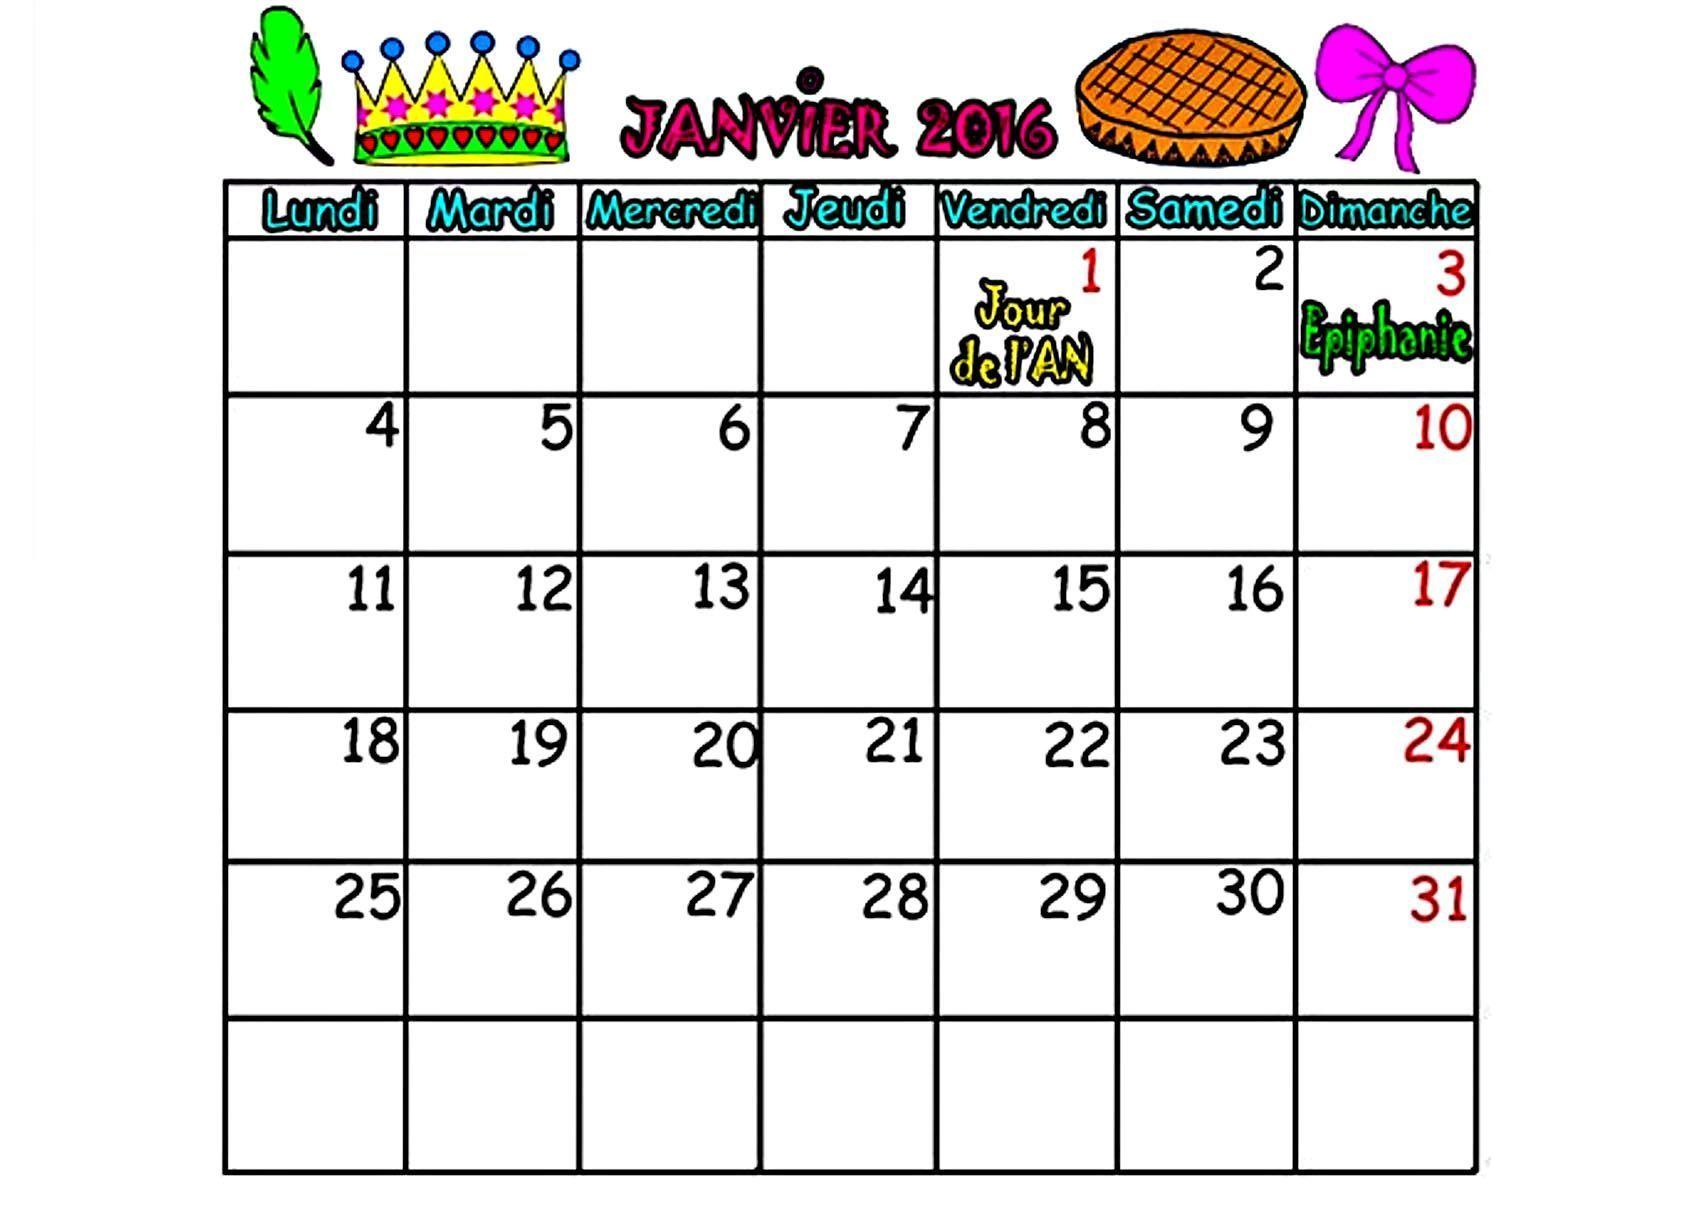 CALENDRIER 2016 mois de JANVIER, FEVRIER, MARS, AVRIL